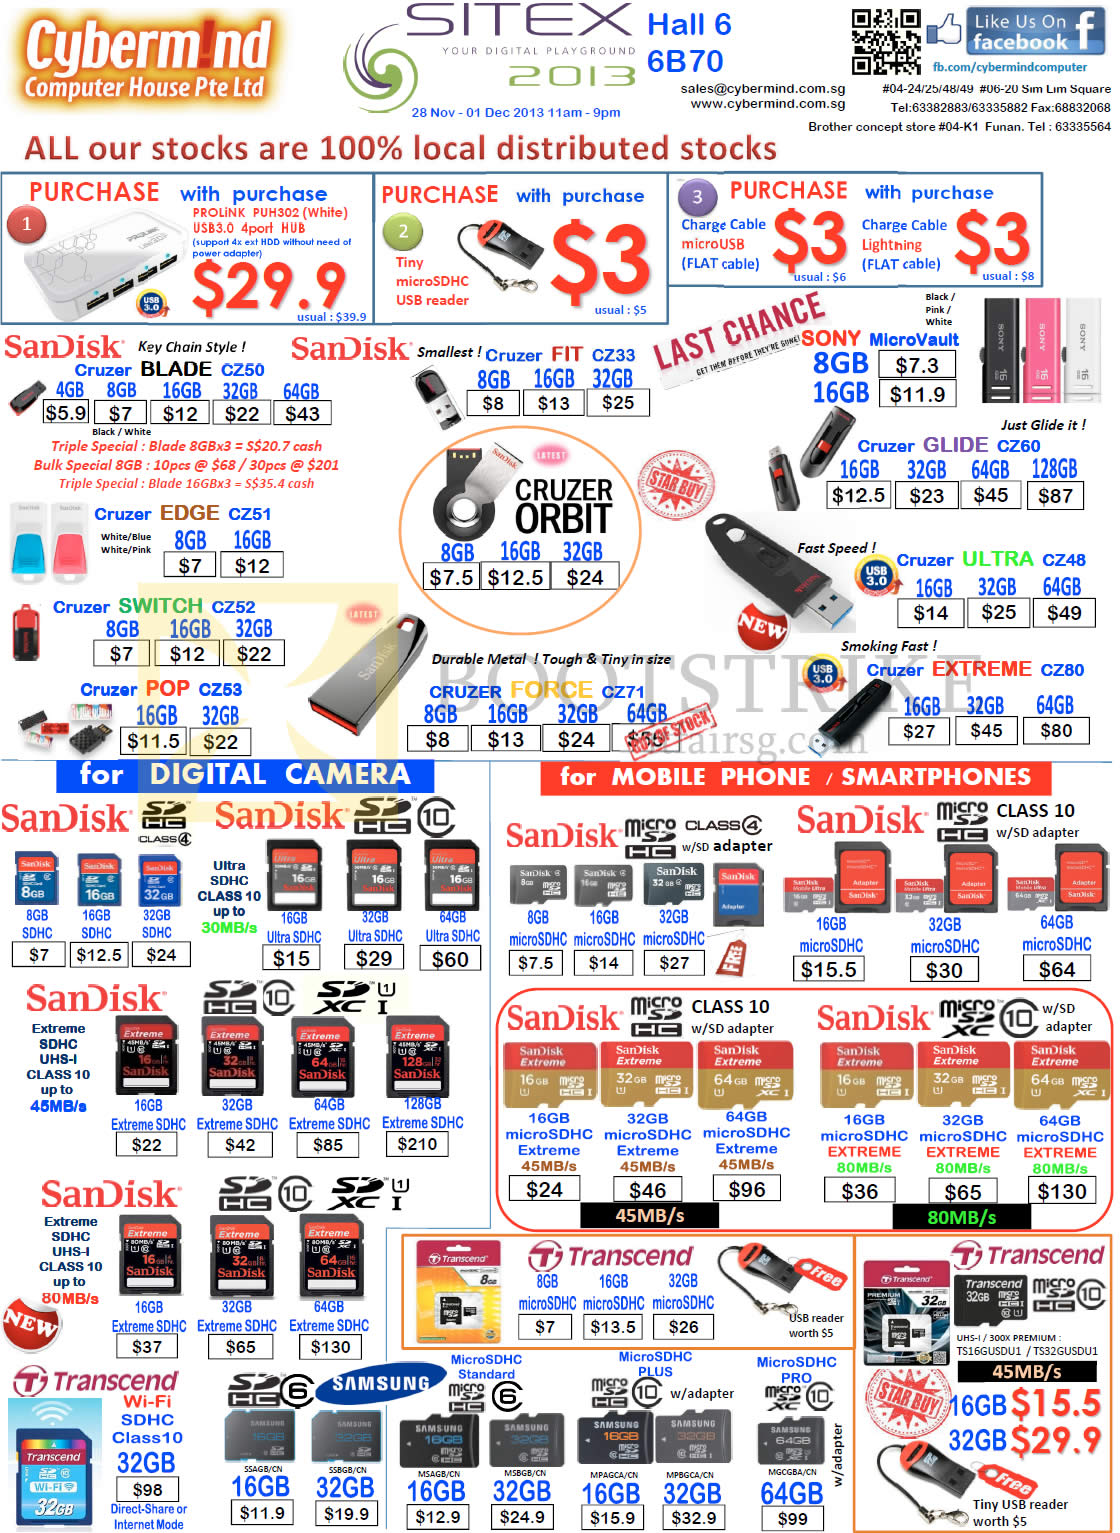 Cybermind USB Flash Drives, Memory Cards, Sandisk Cruzer